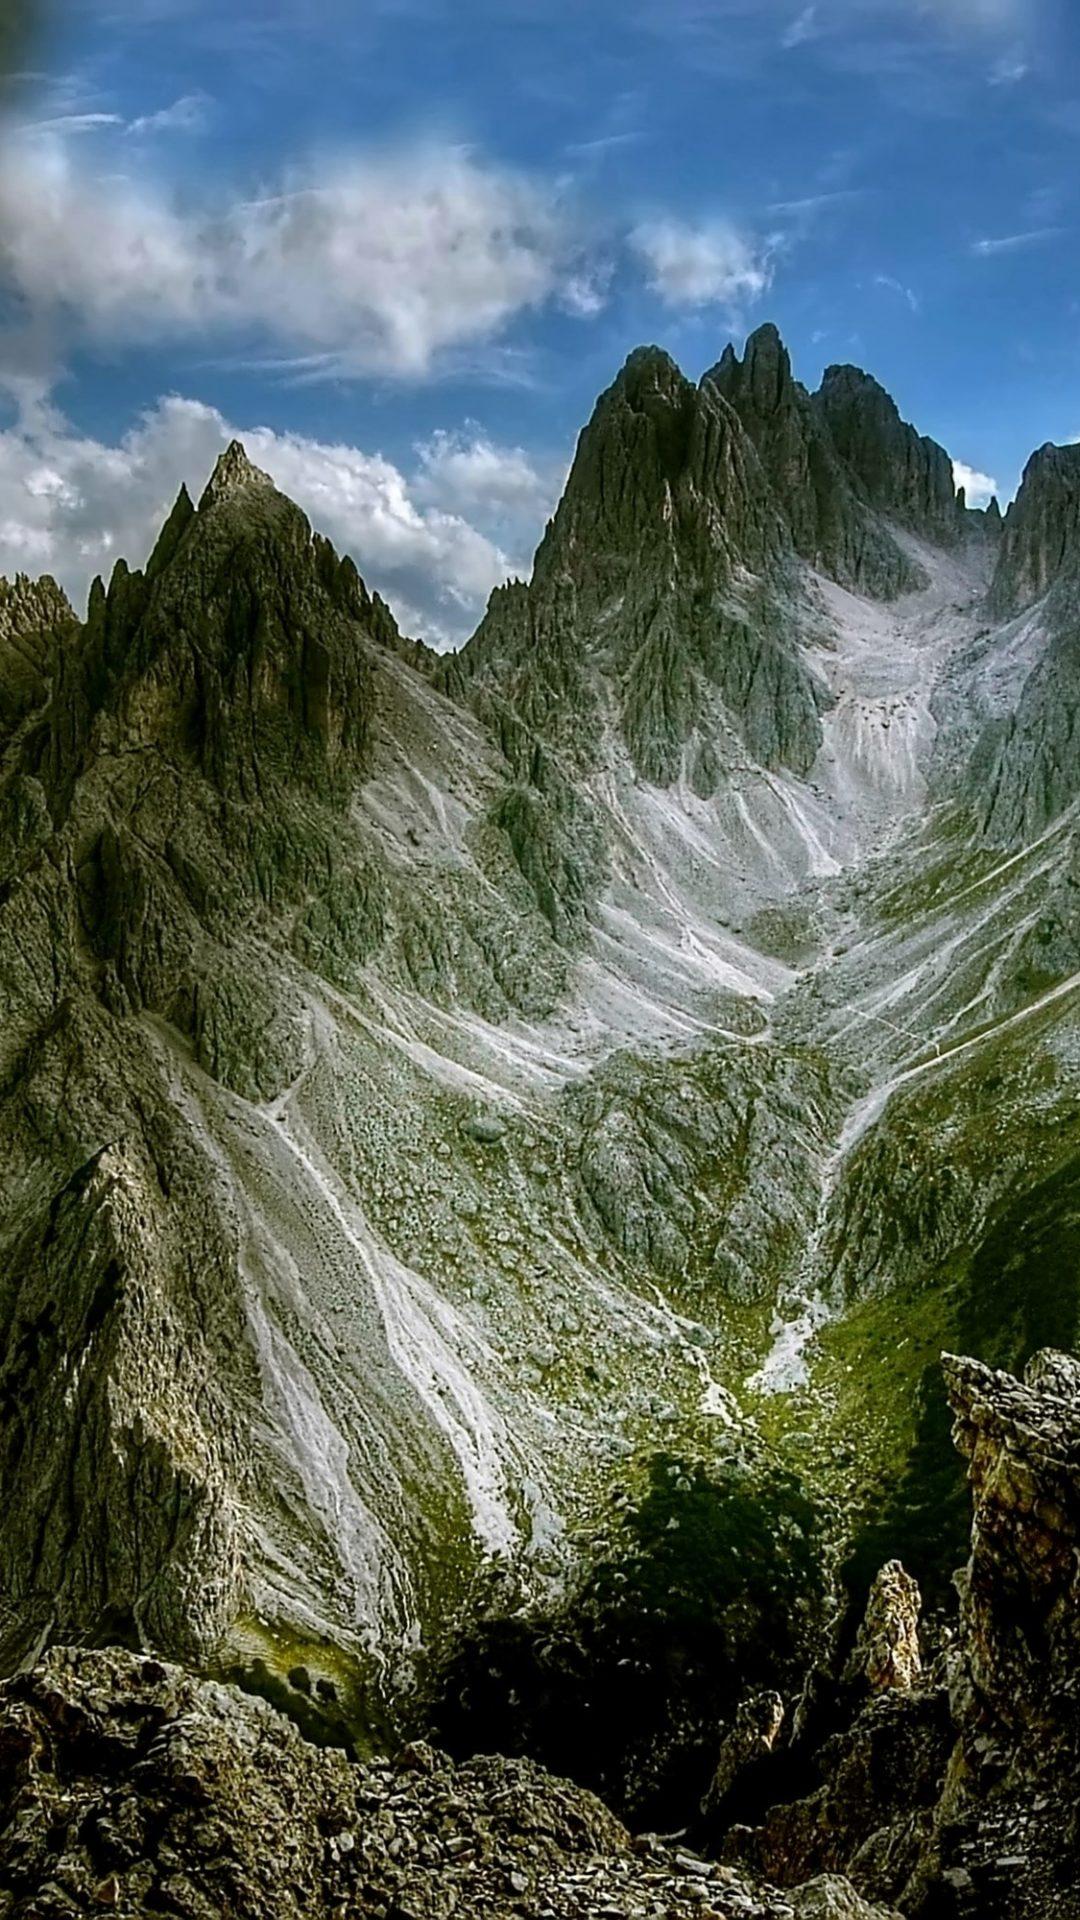 Iphone X Full Wallpaper Size Dolomites Mountains Cadini Di Misurina Hd Wallpaper